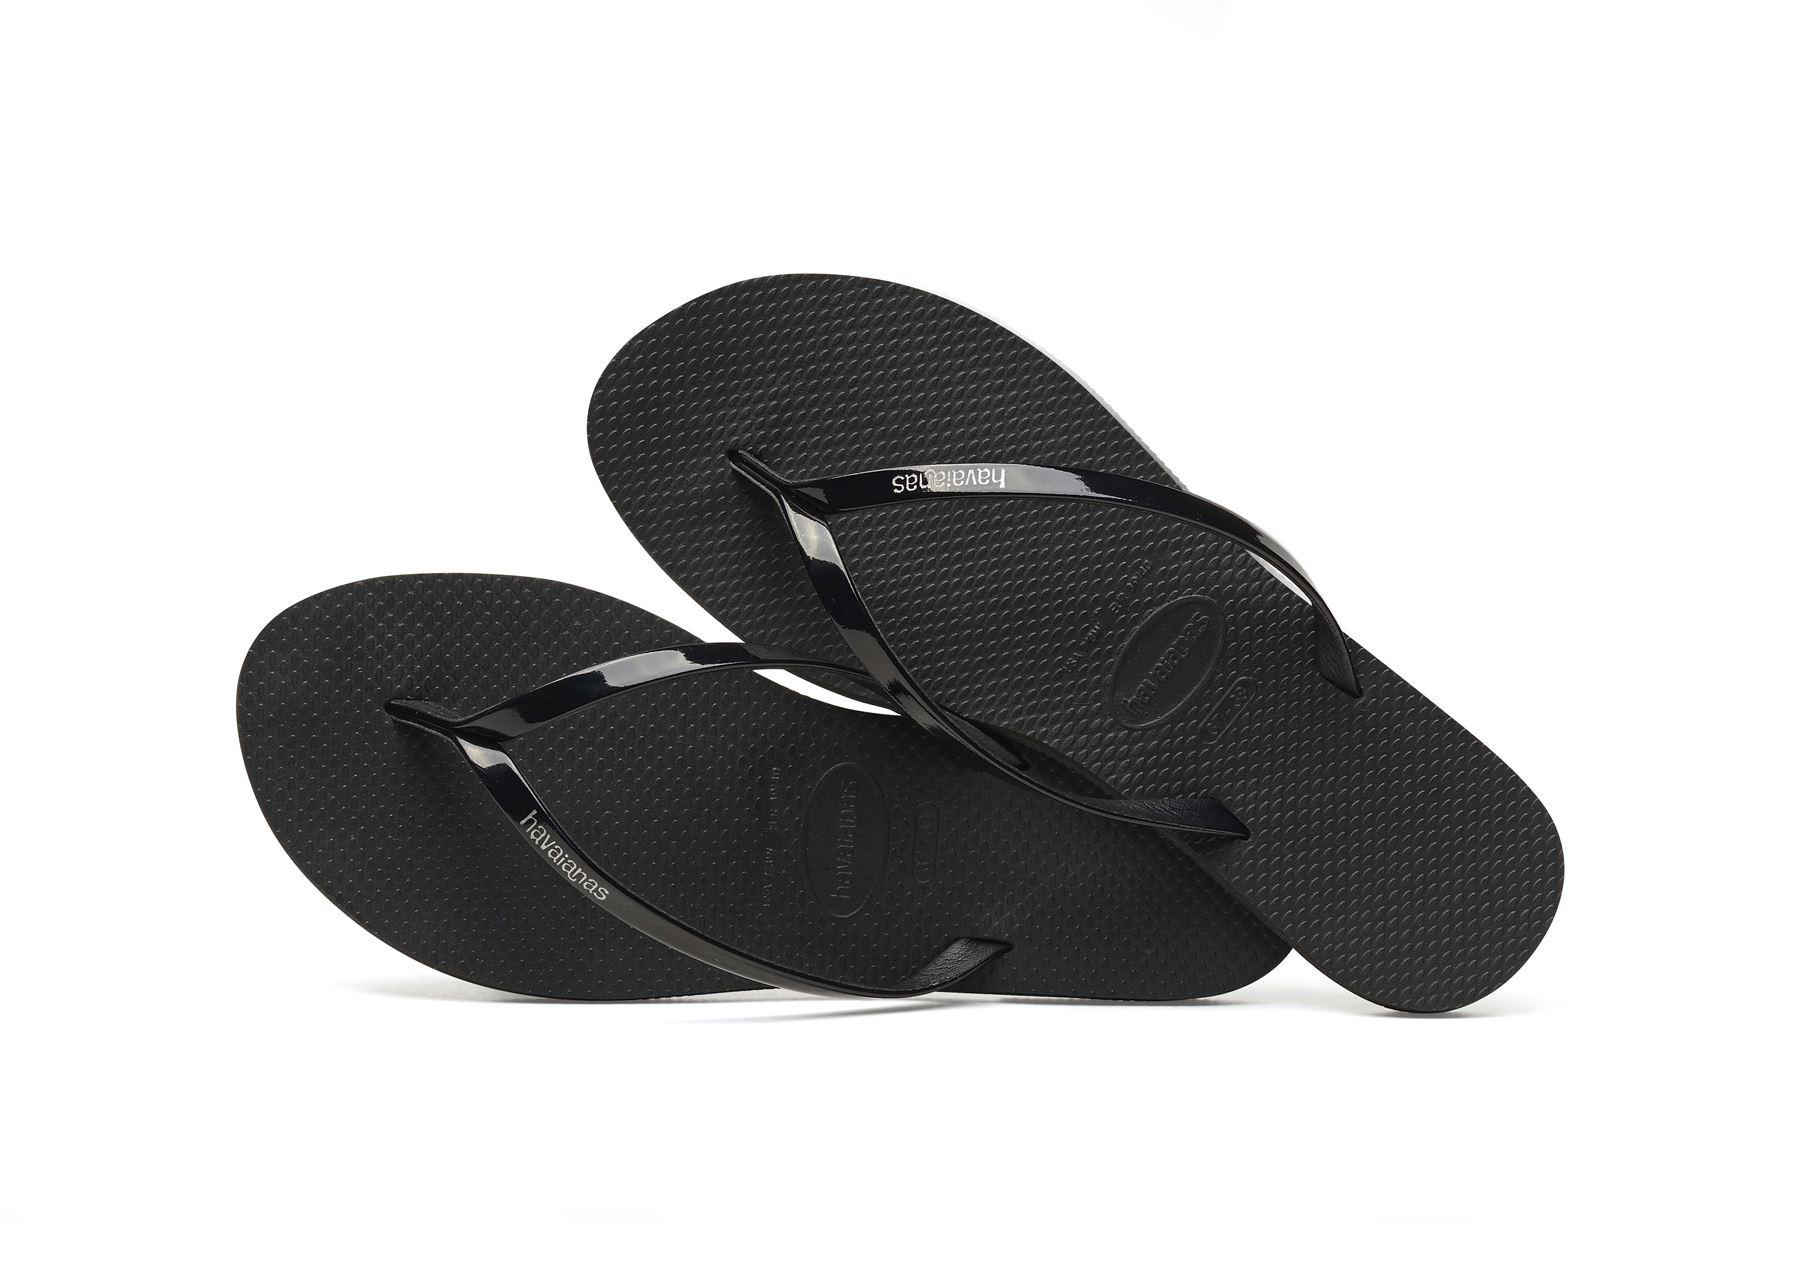 Havaianas-You-Metallic-Flip-Flops-Women-Summer-Beach-Sandals-Wide-Range-Colours miniature 5